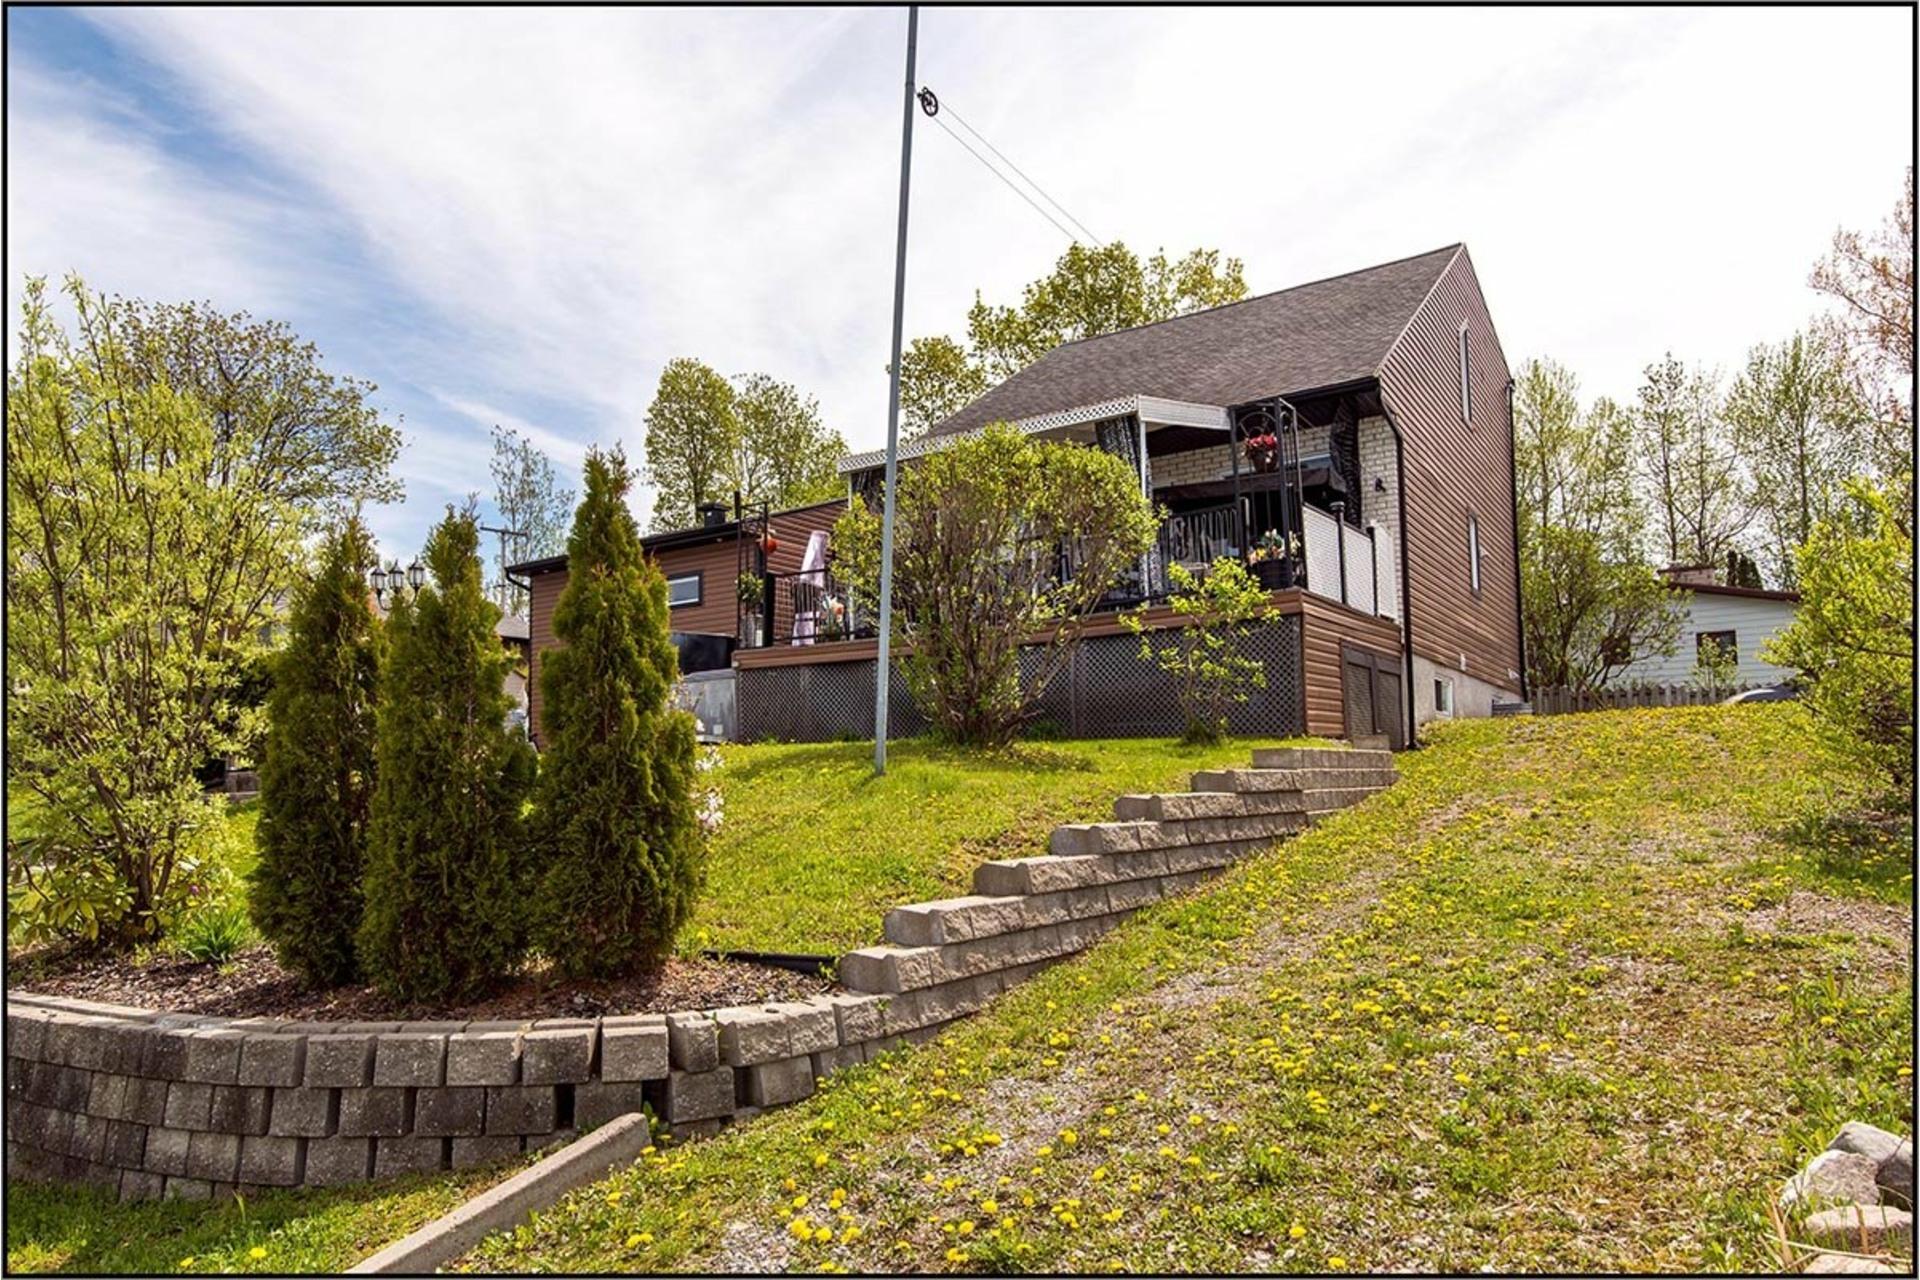 image 31 - House For sale Sainte-Foy/Sillery/Cap-Rouge Québec  - 13 rooms